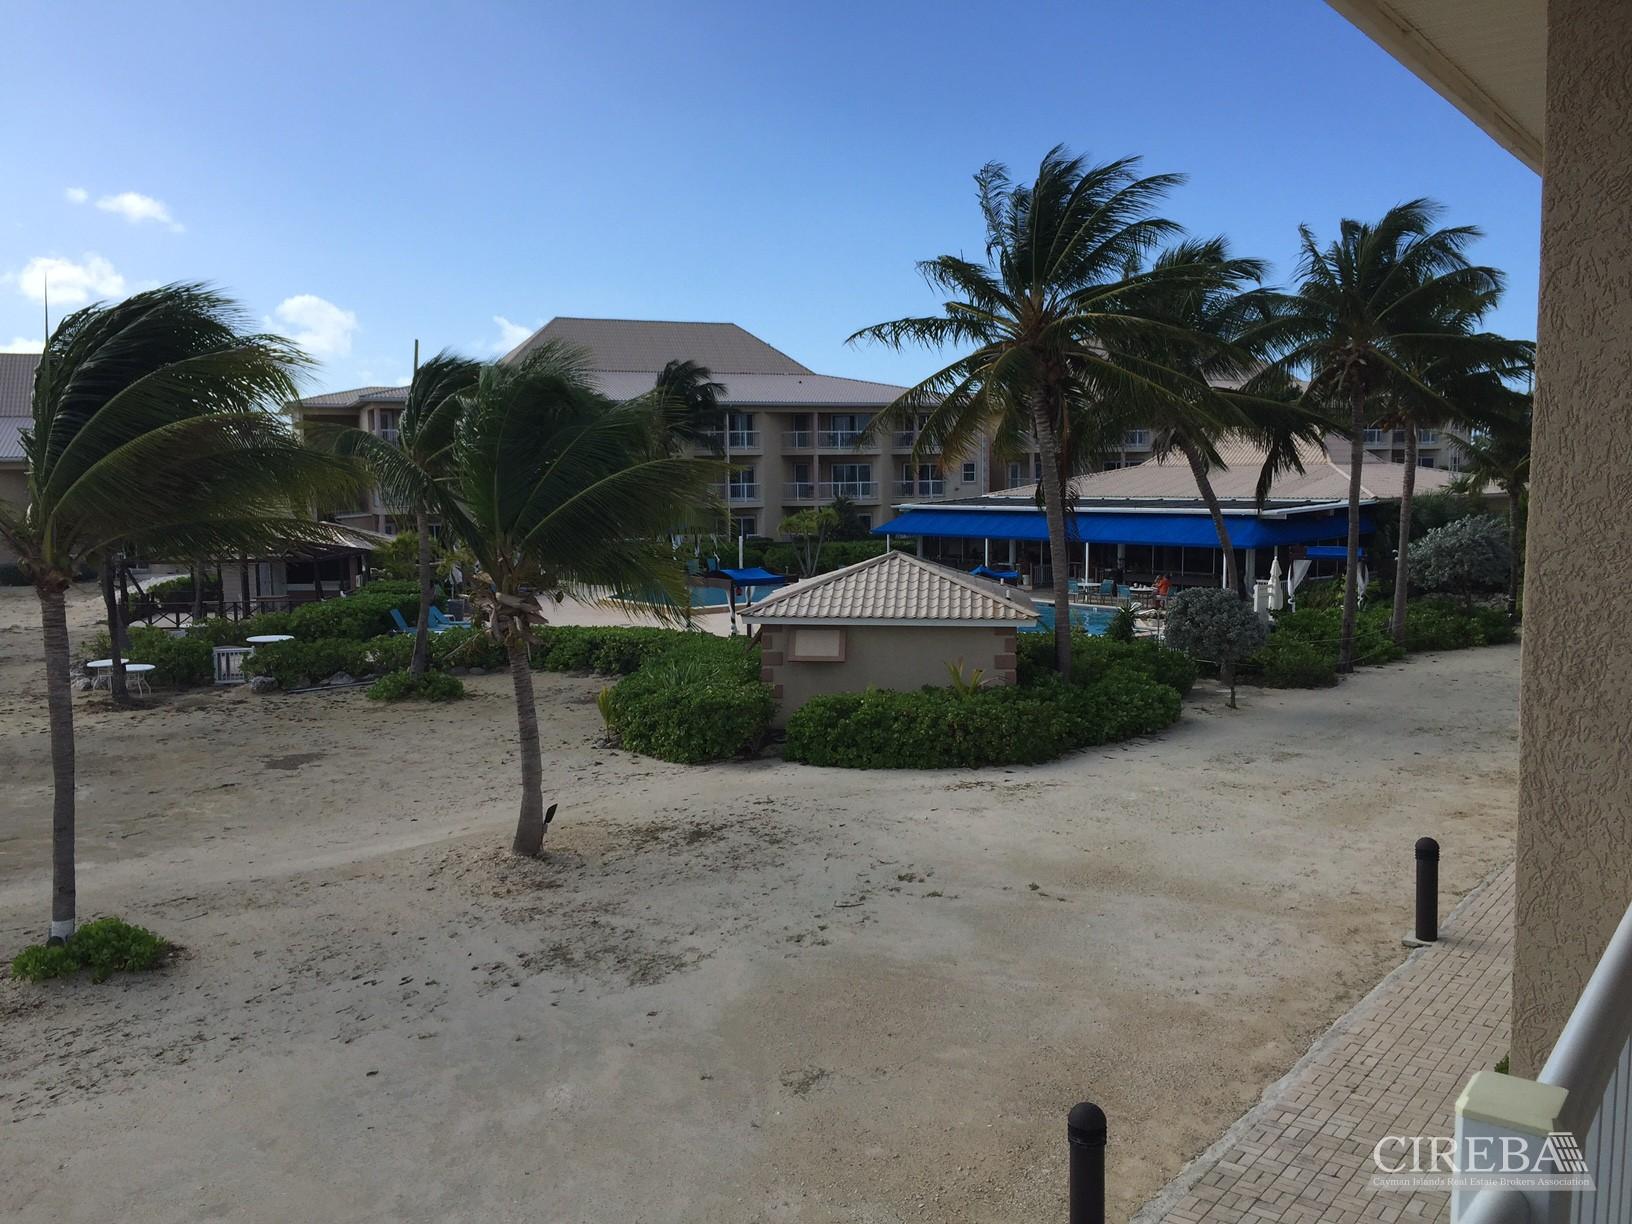 GRAND CAYMANIAN BEACH CLUB & RESORT